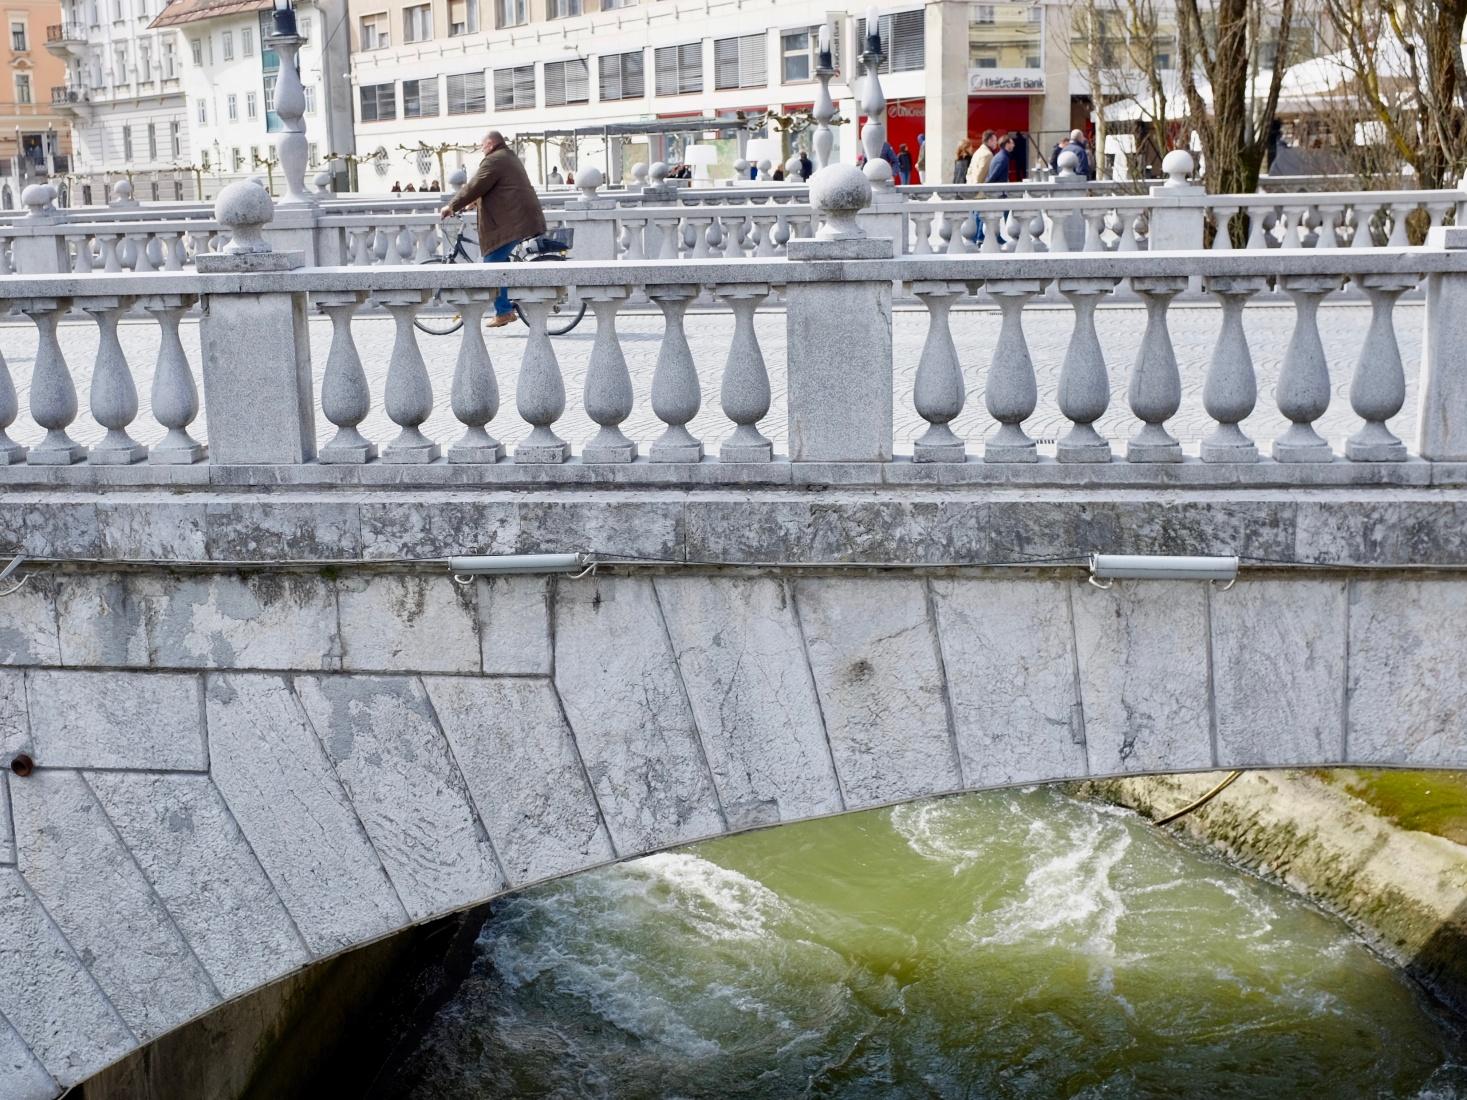 Decorative bridge designed by Jože Plečnik in Ljubljana, Slovenia, wtih pedestrian and classical seeming architecture over the green Ljubljanica River.